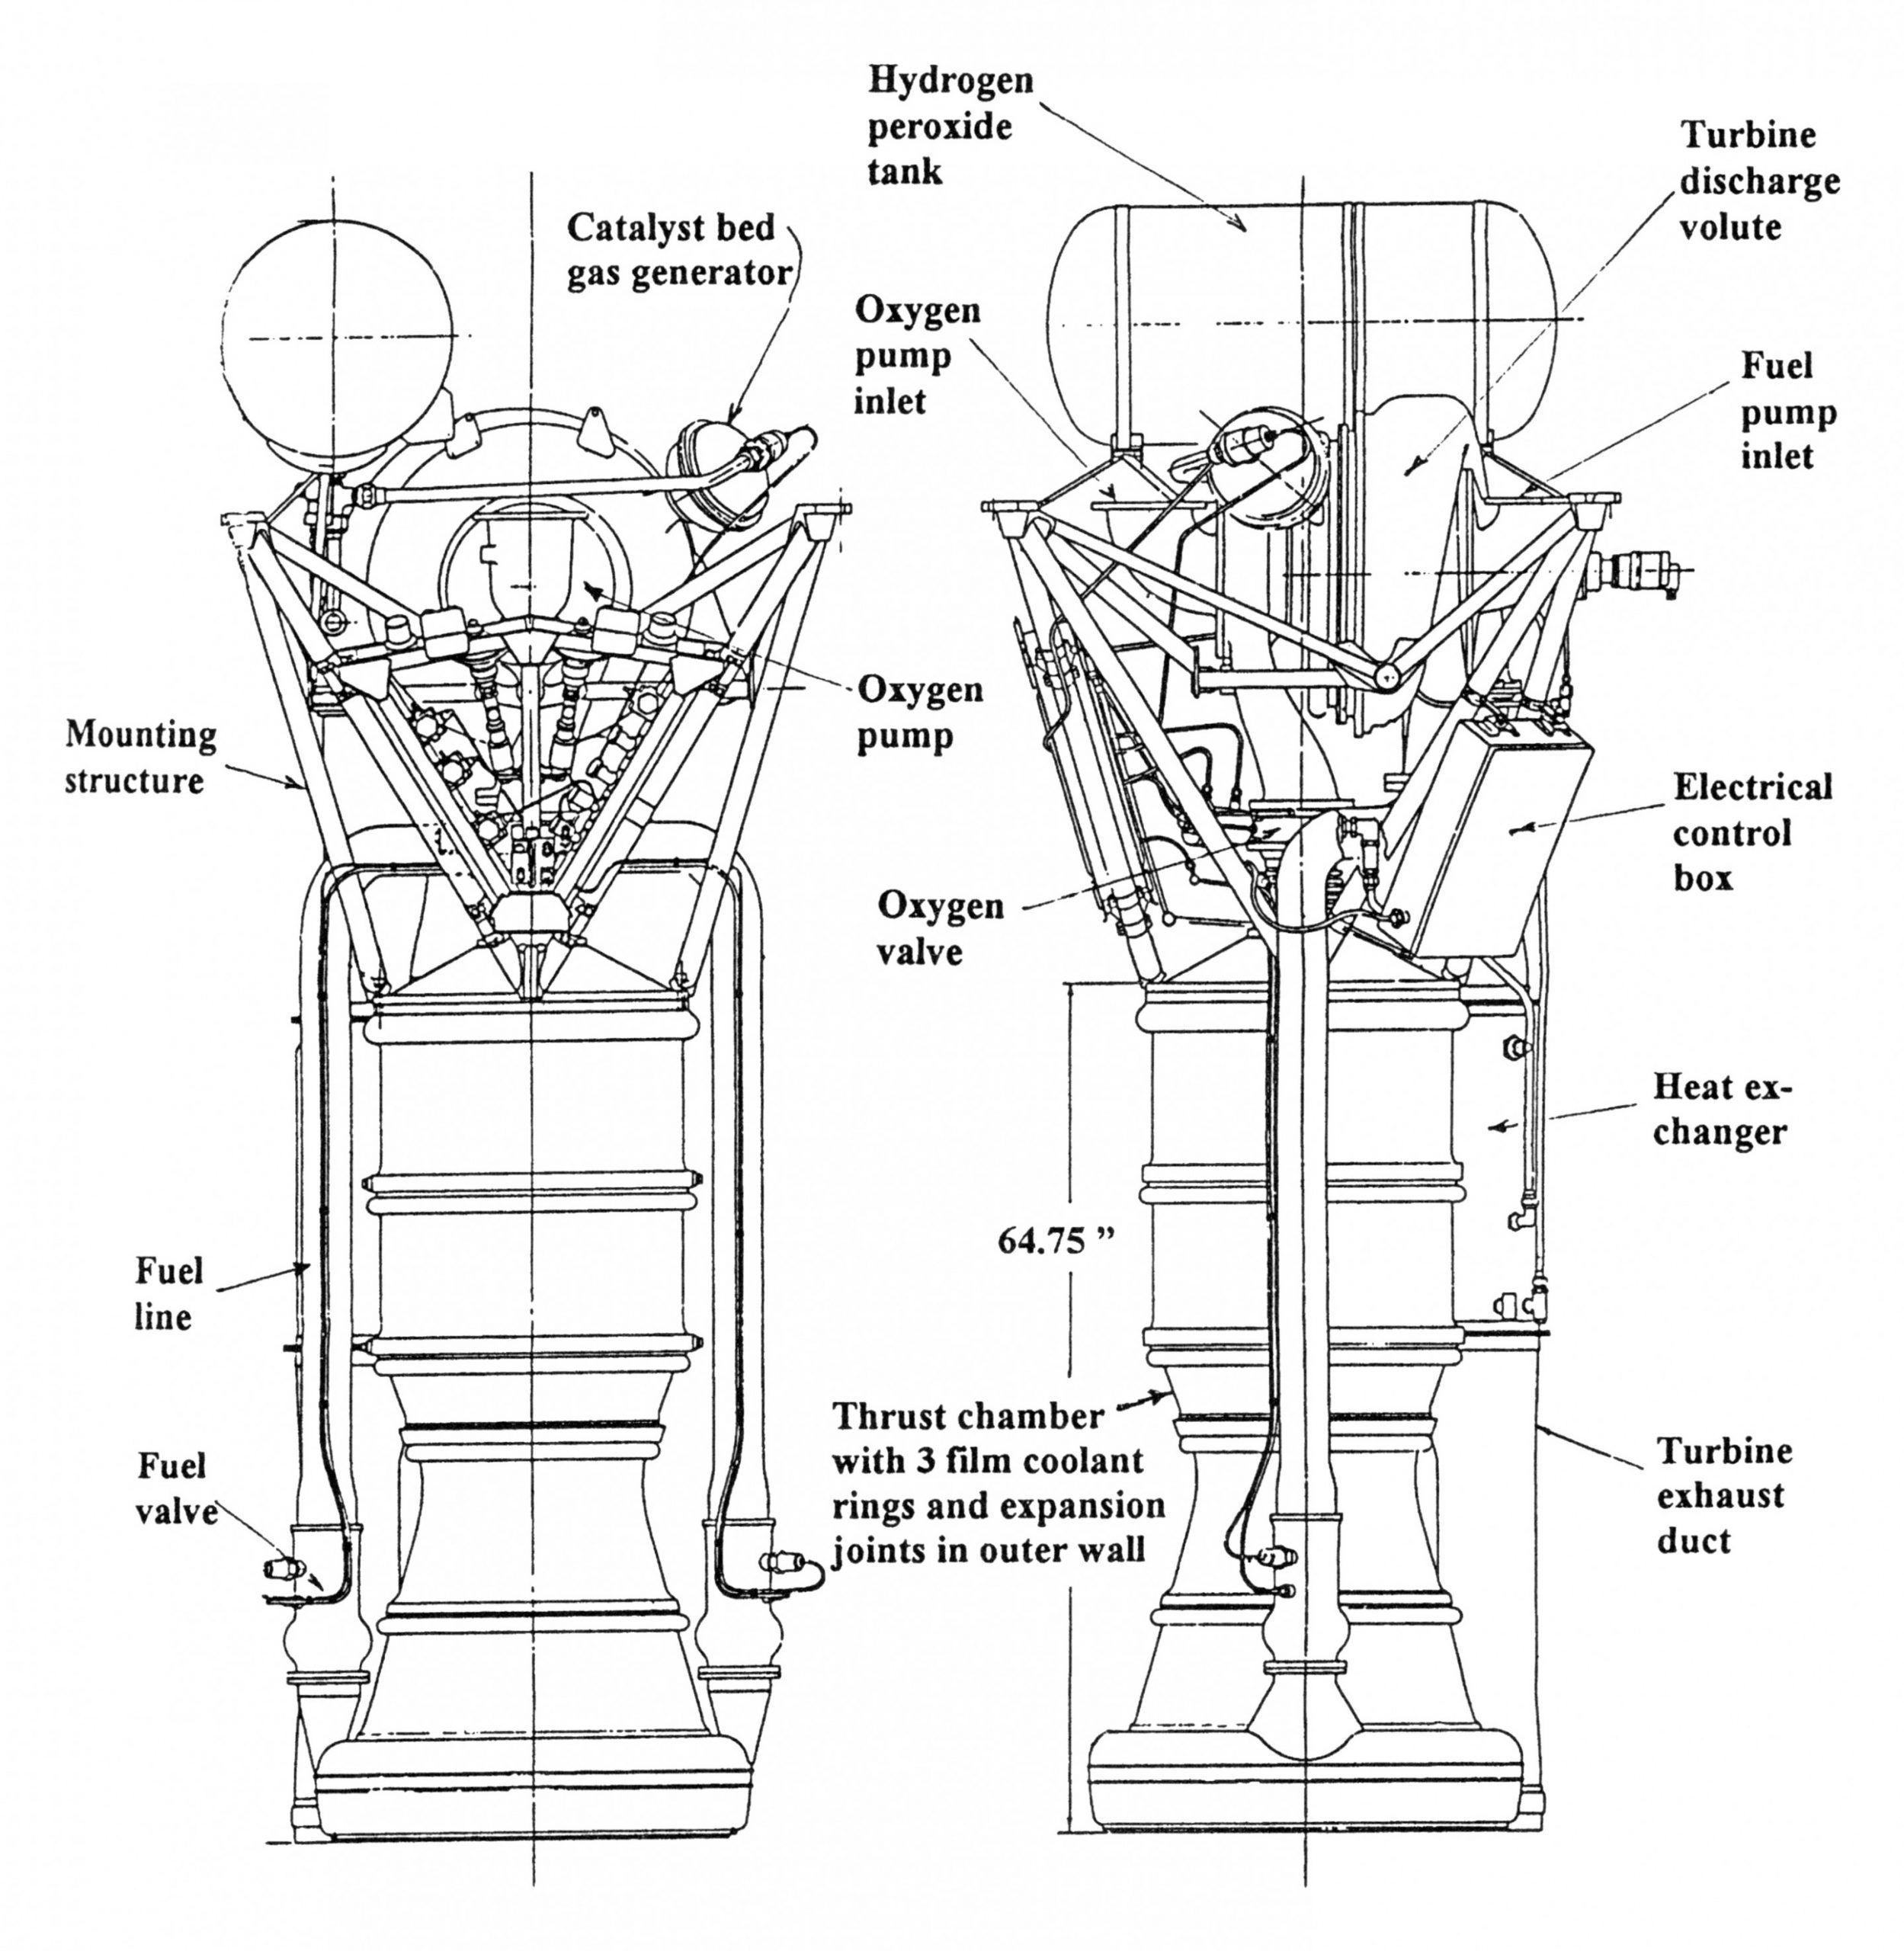 Pin On Rocket Diagrams